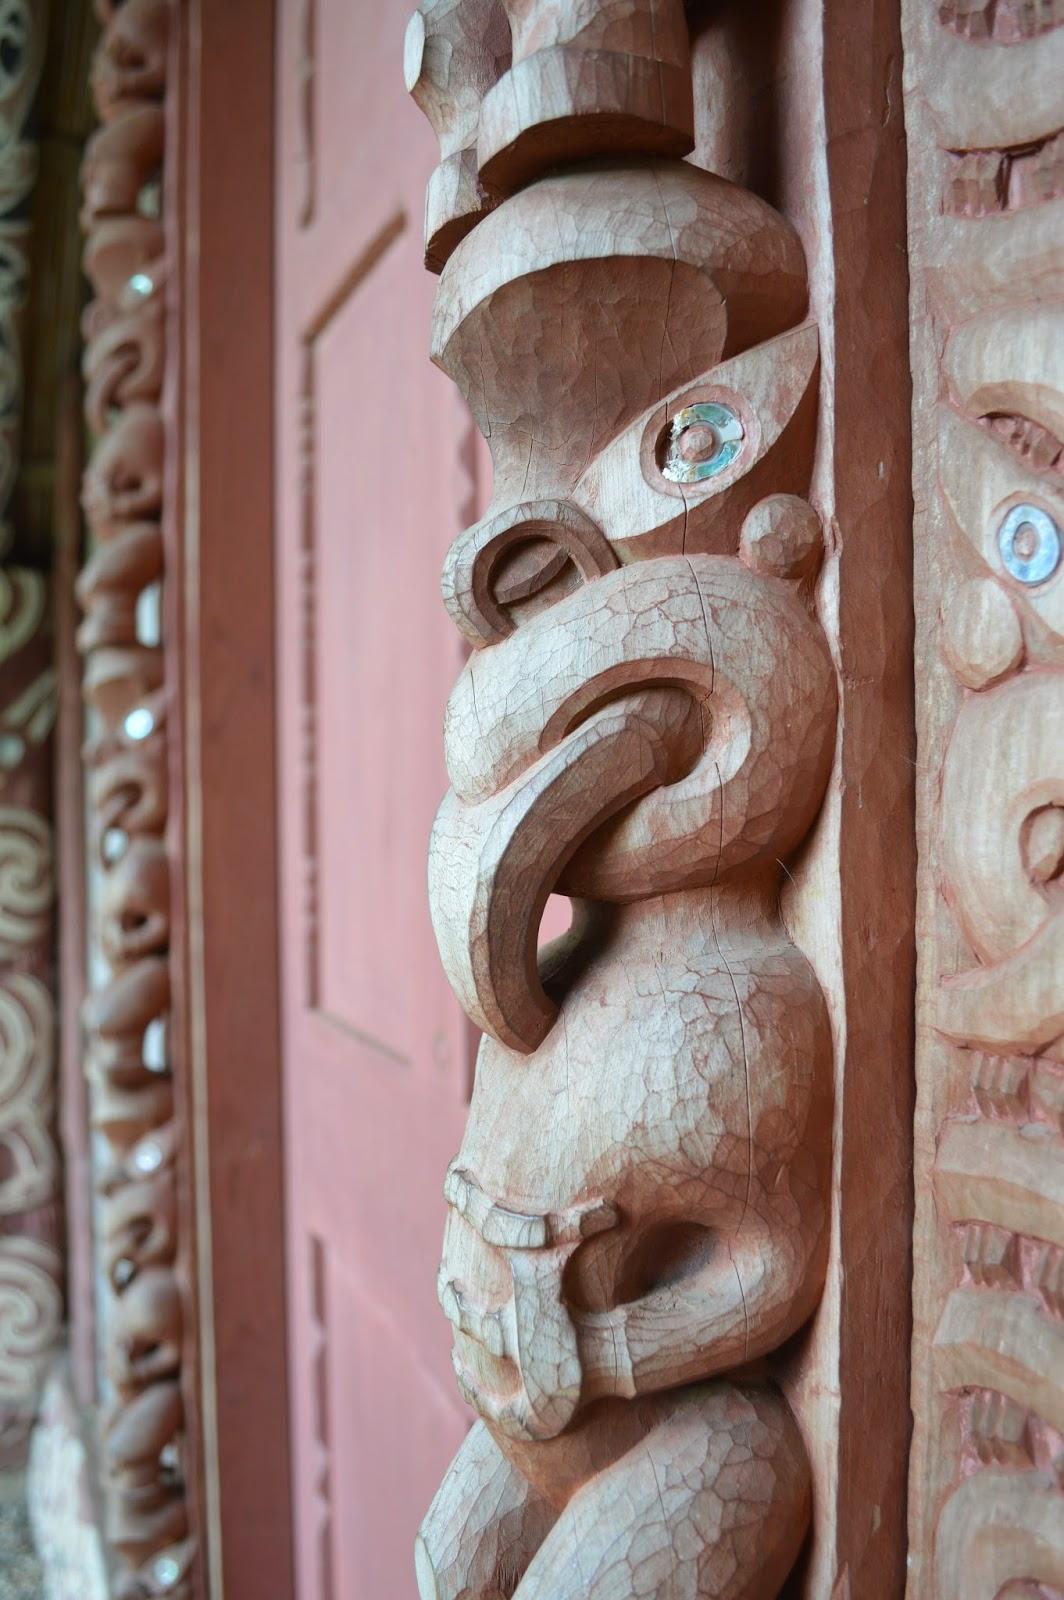 photo, picture, photography, Hinemihi, Maori Meeting house, whare nui, wharenui, Clandon, Guilford, UK, New Zealand, 1880, Wiliam Onslow, sacred,